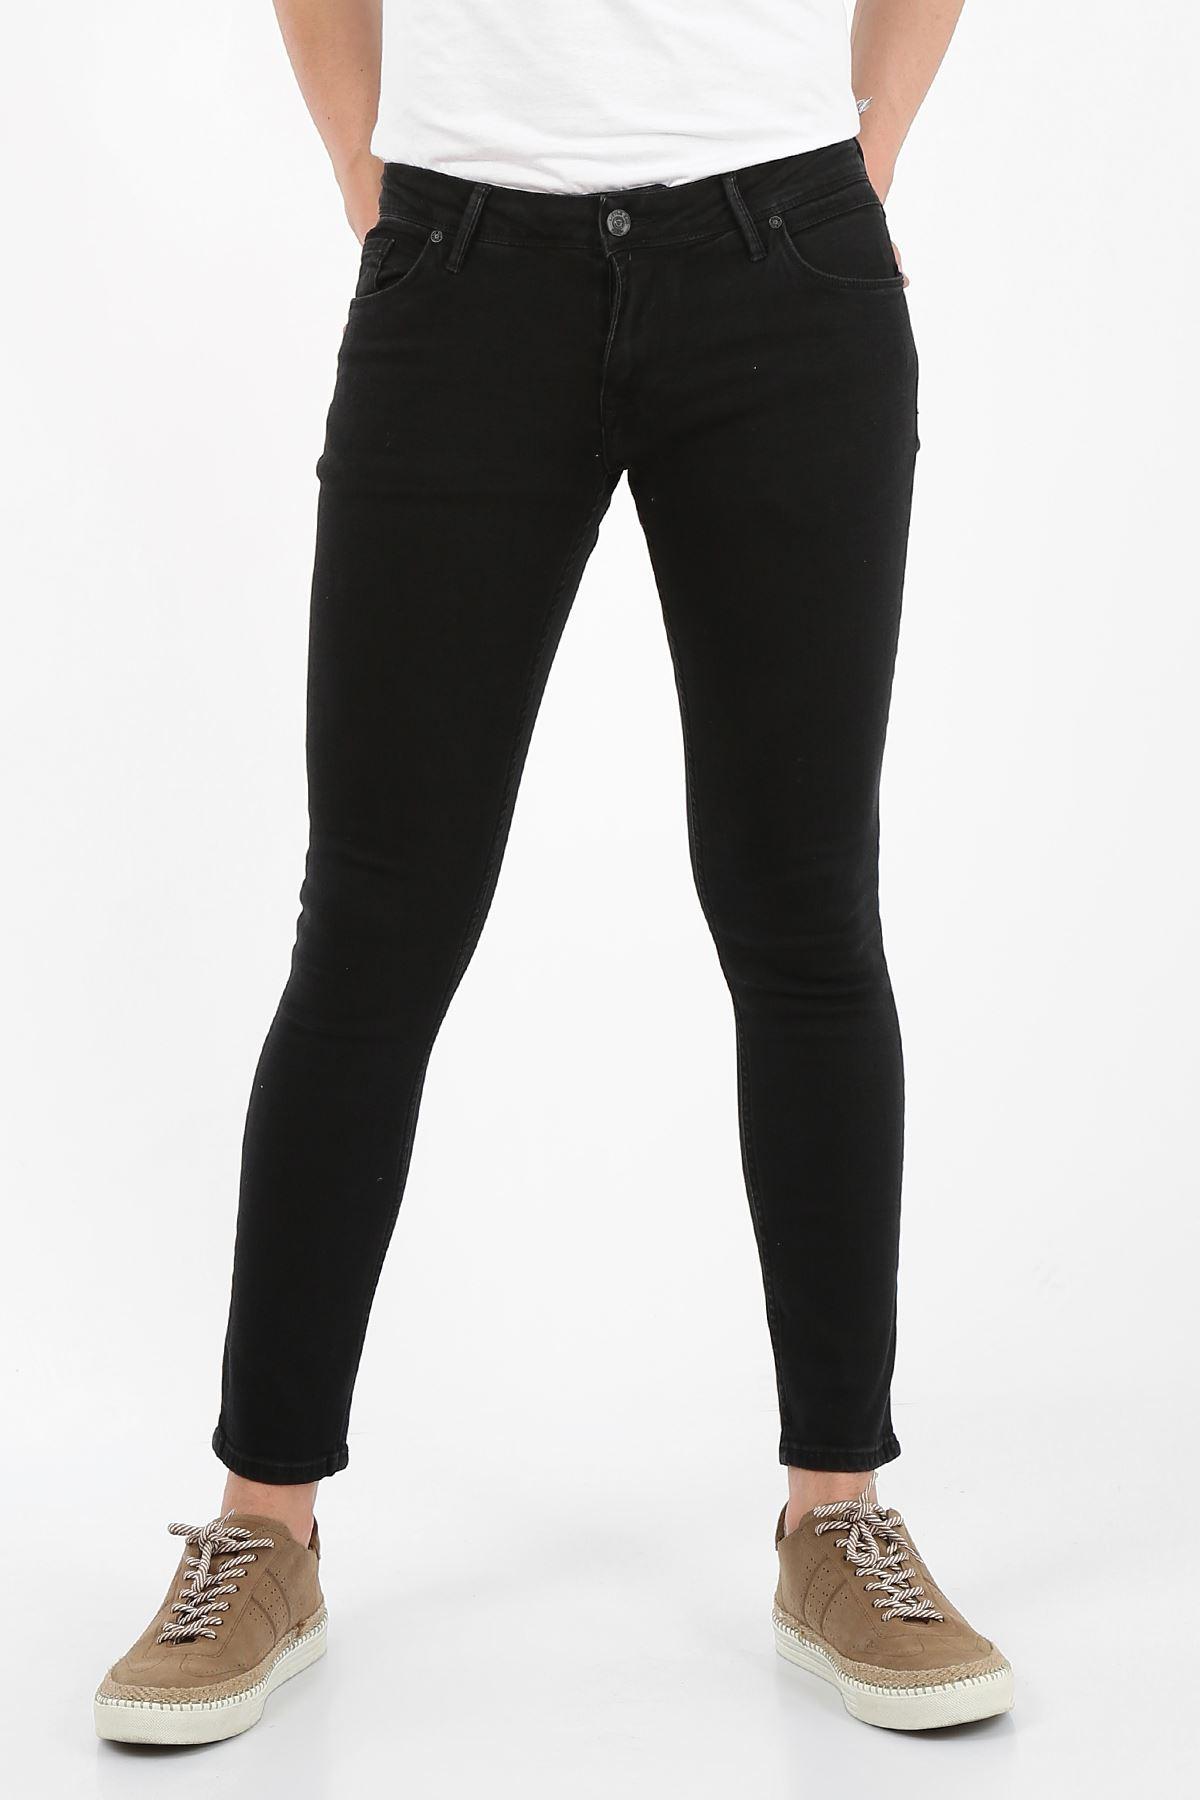 Siyah Süperslim/sknny Fit Fermuarlı Erkek Jeans Pantolon